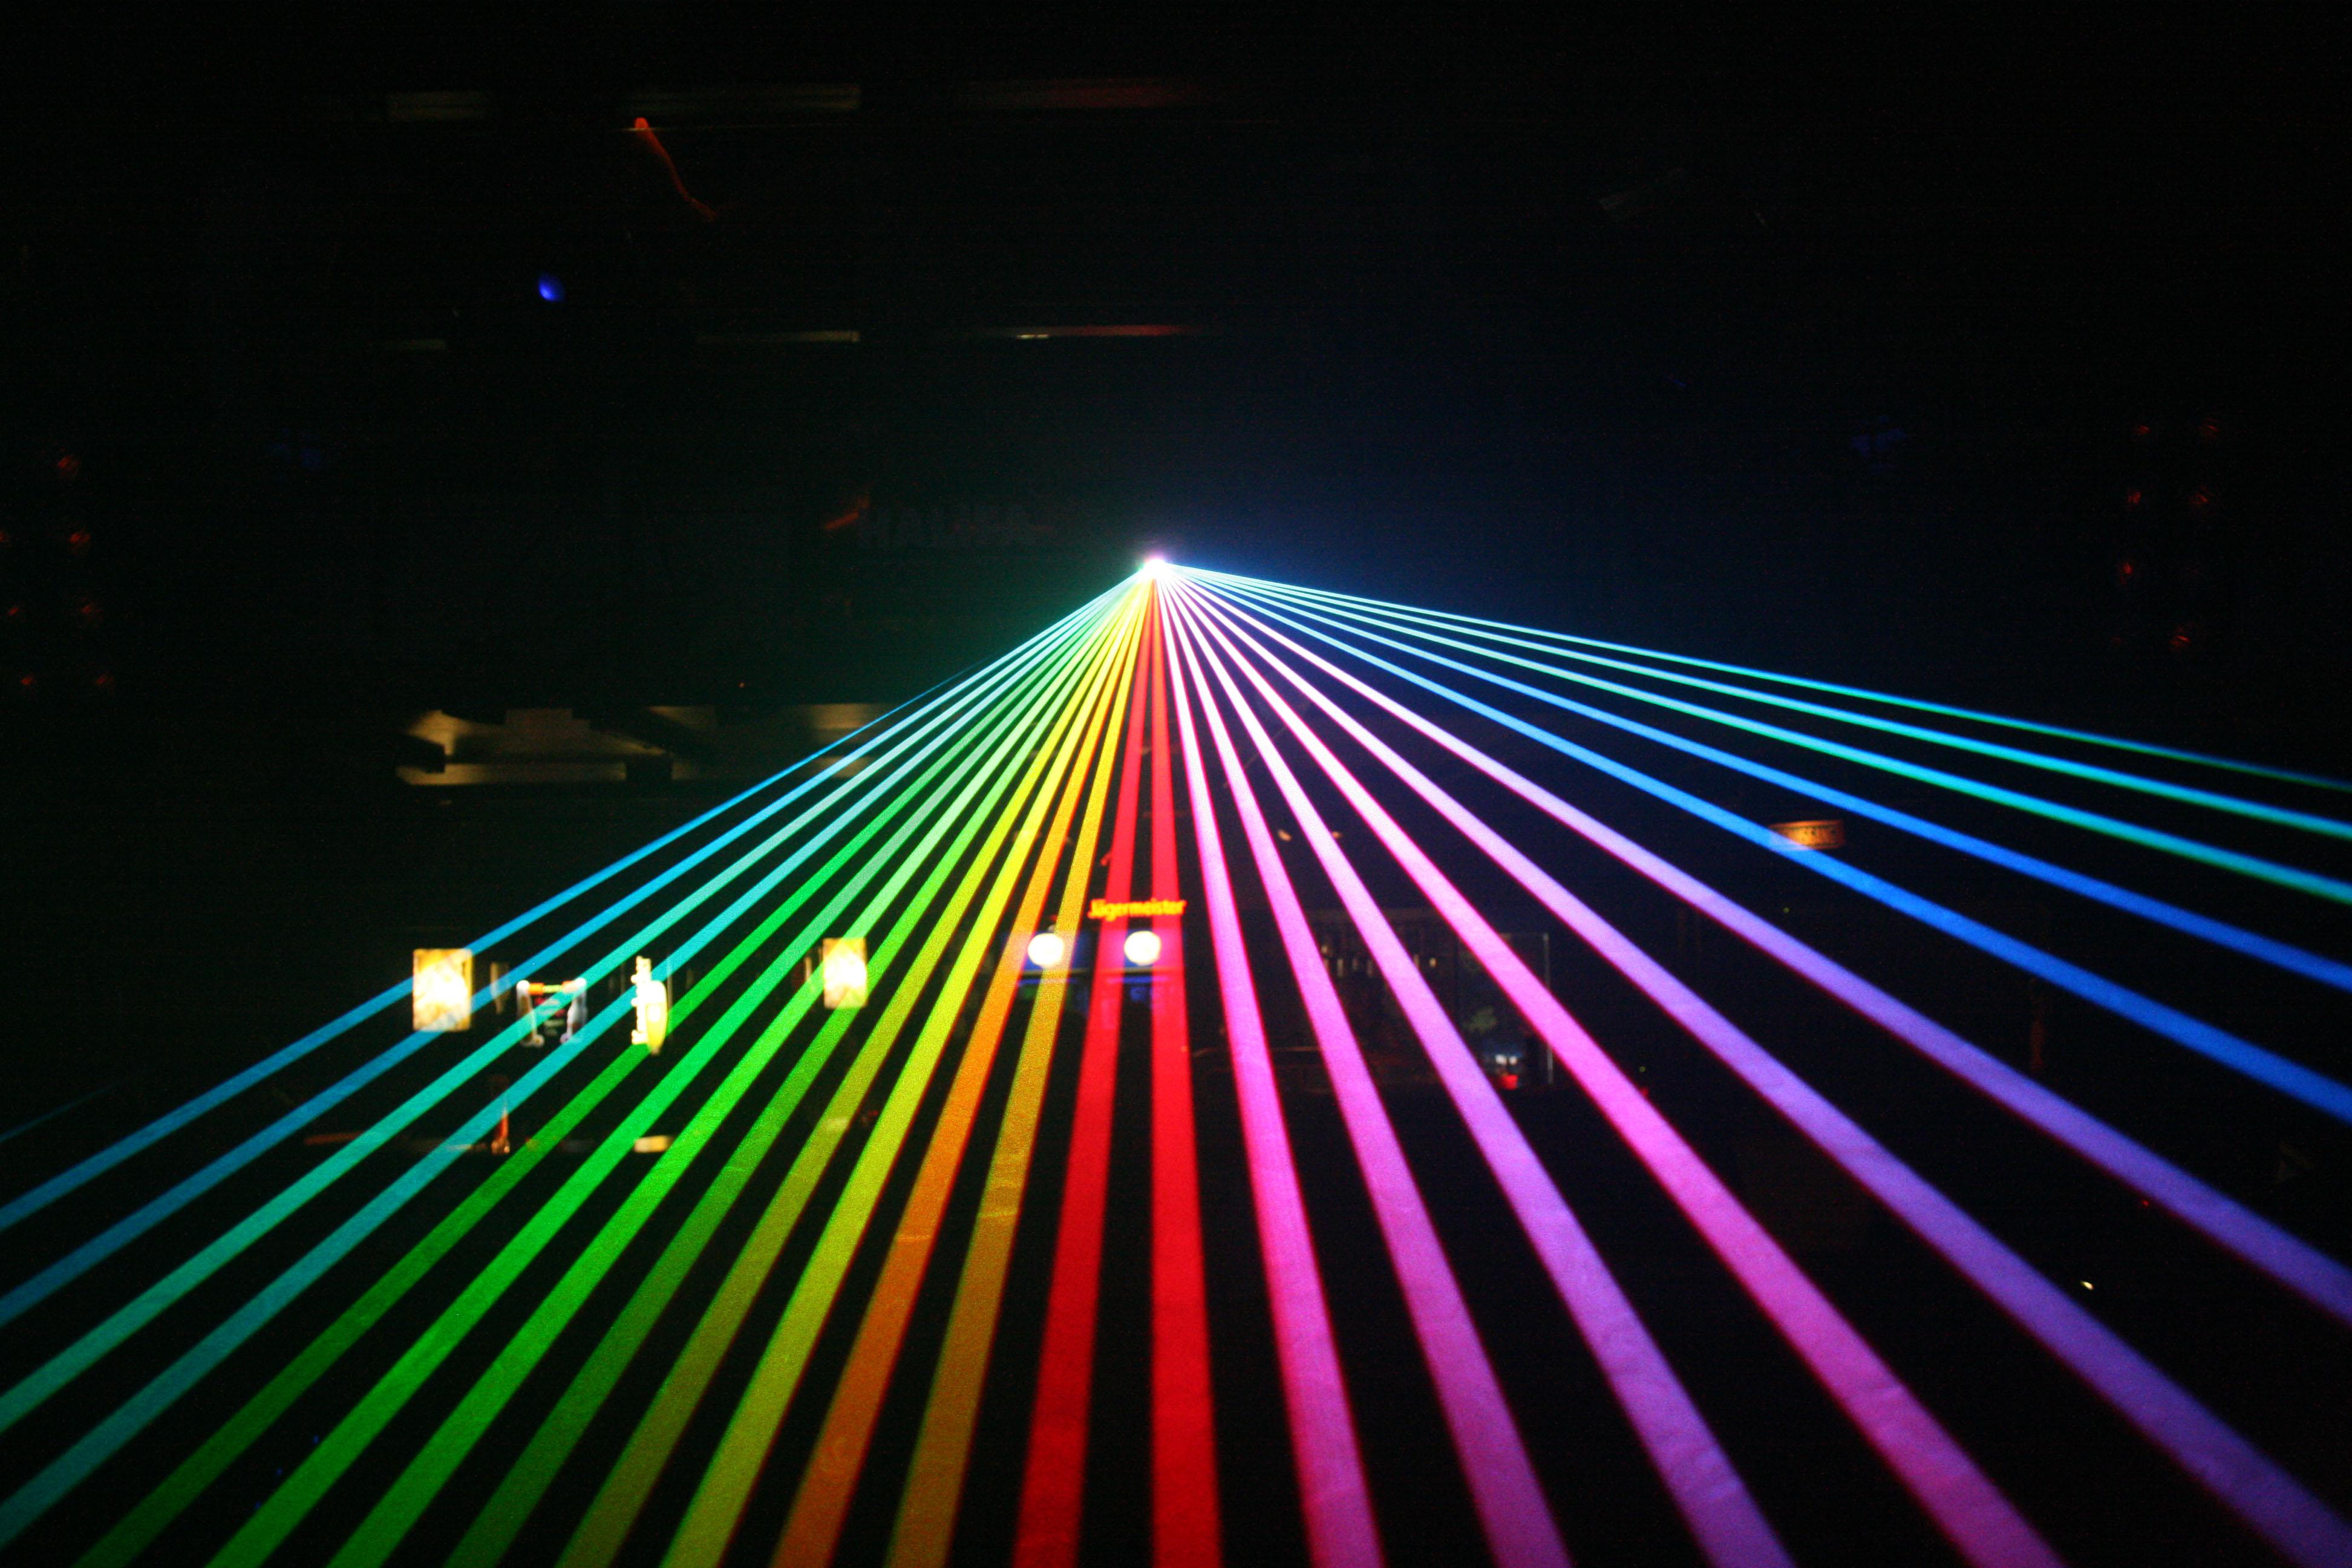 laser light show - photo #32